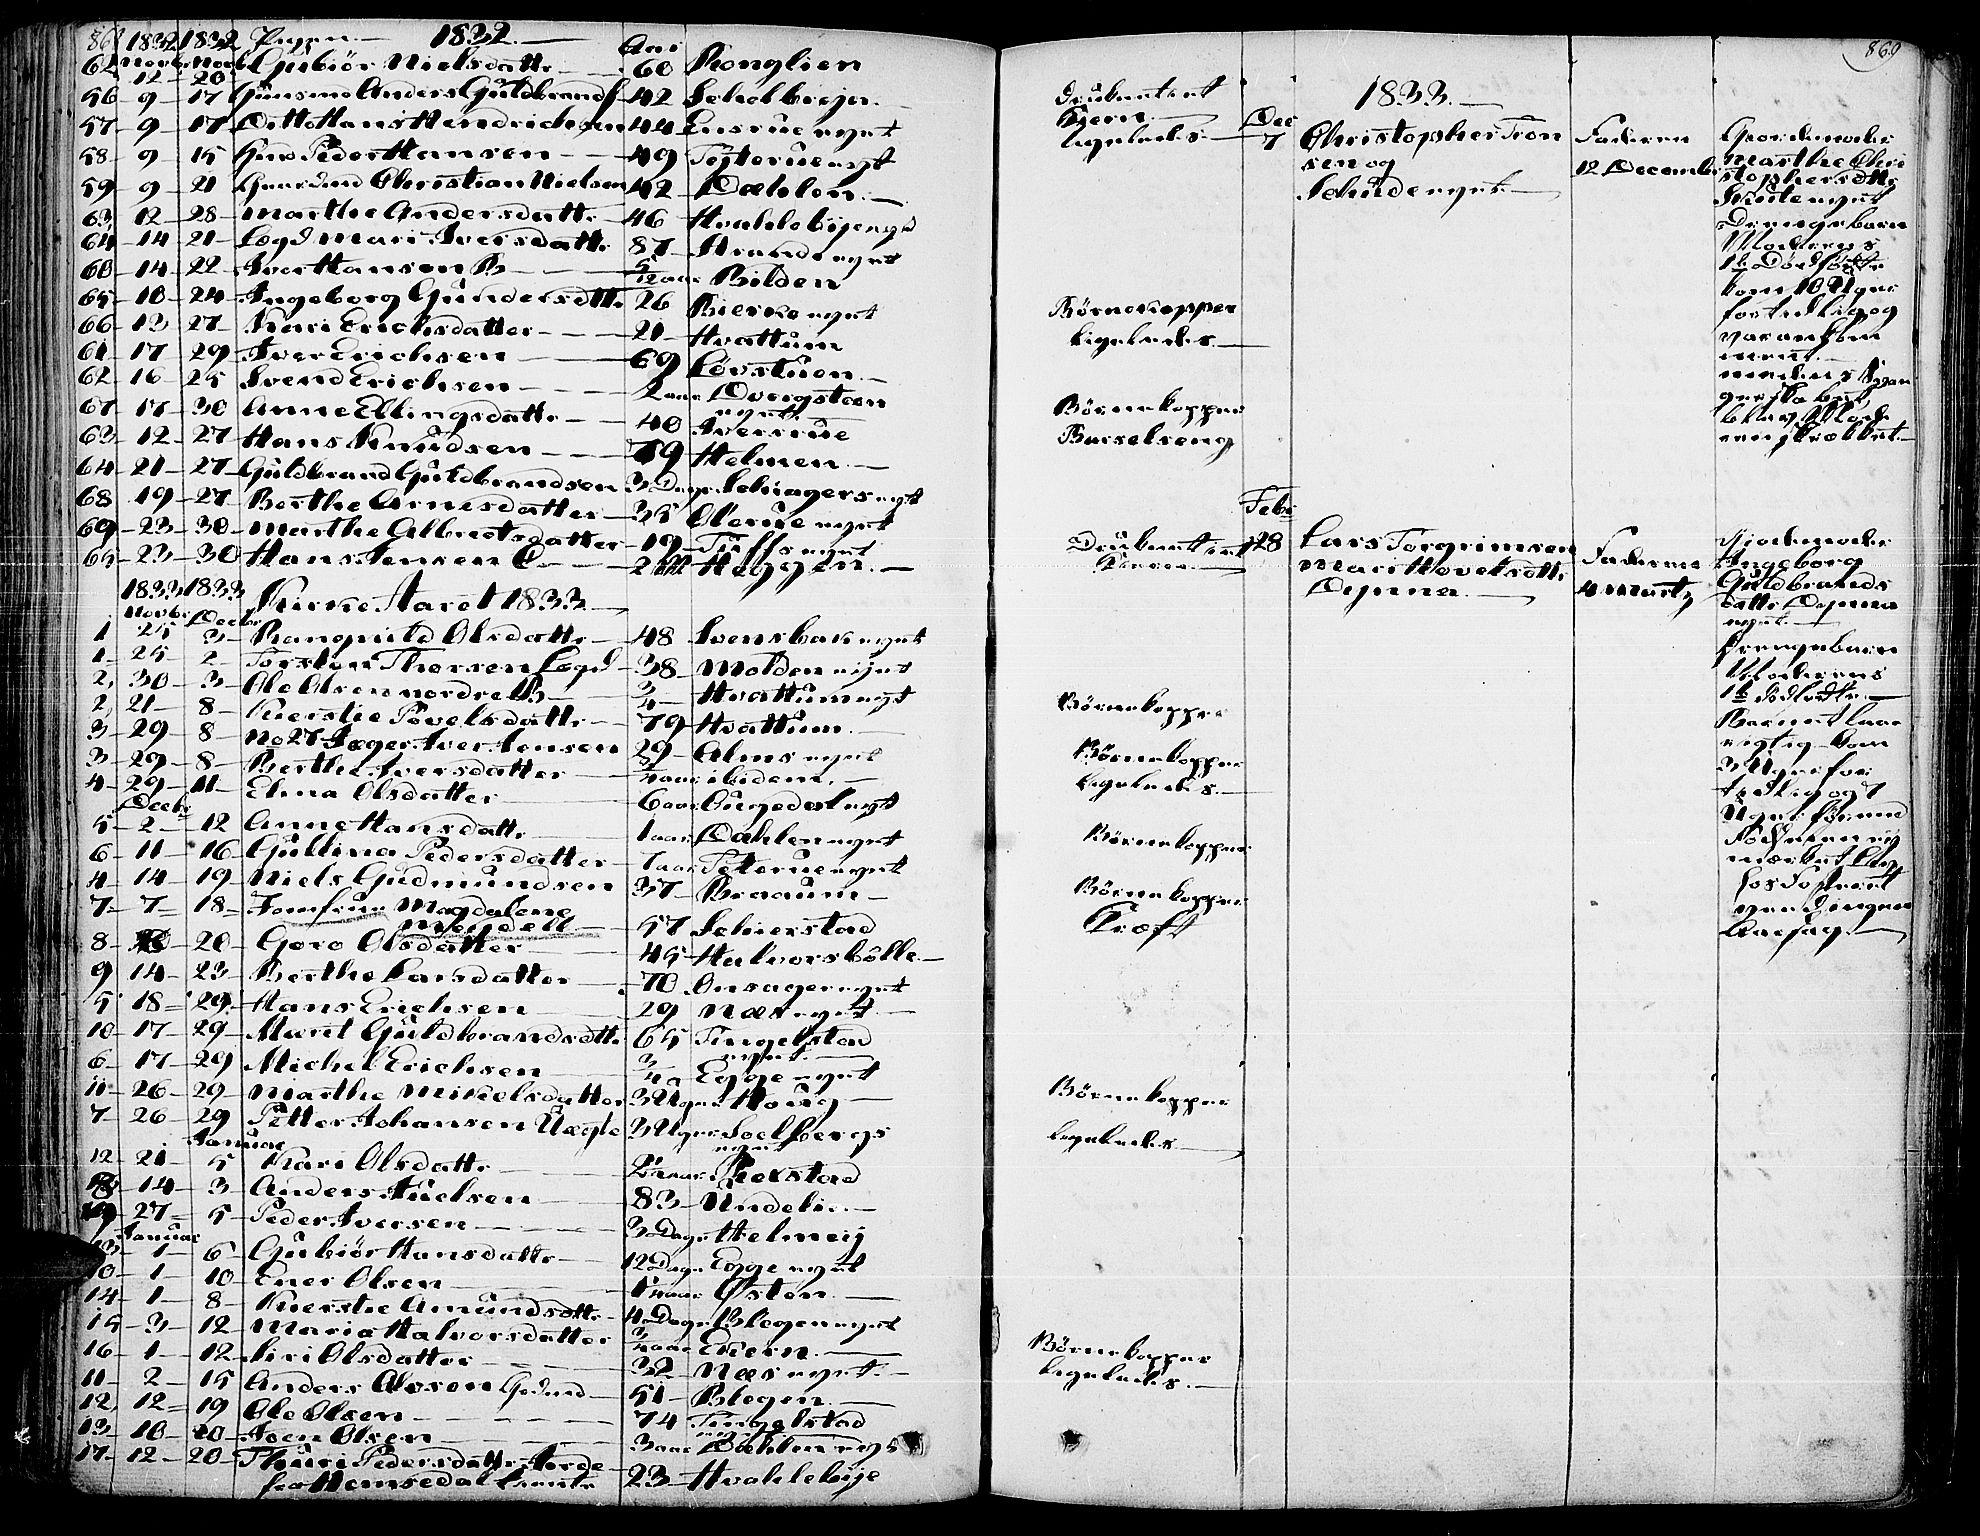 SAH, Gran prestekontor, Parish register (official) no. 10, 1824-1842, p. 868-869